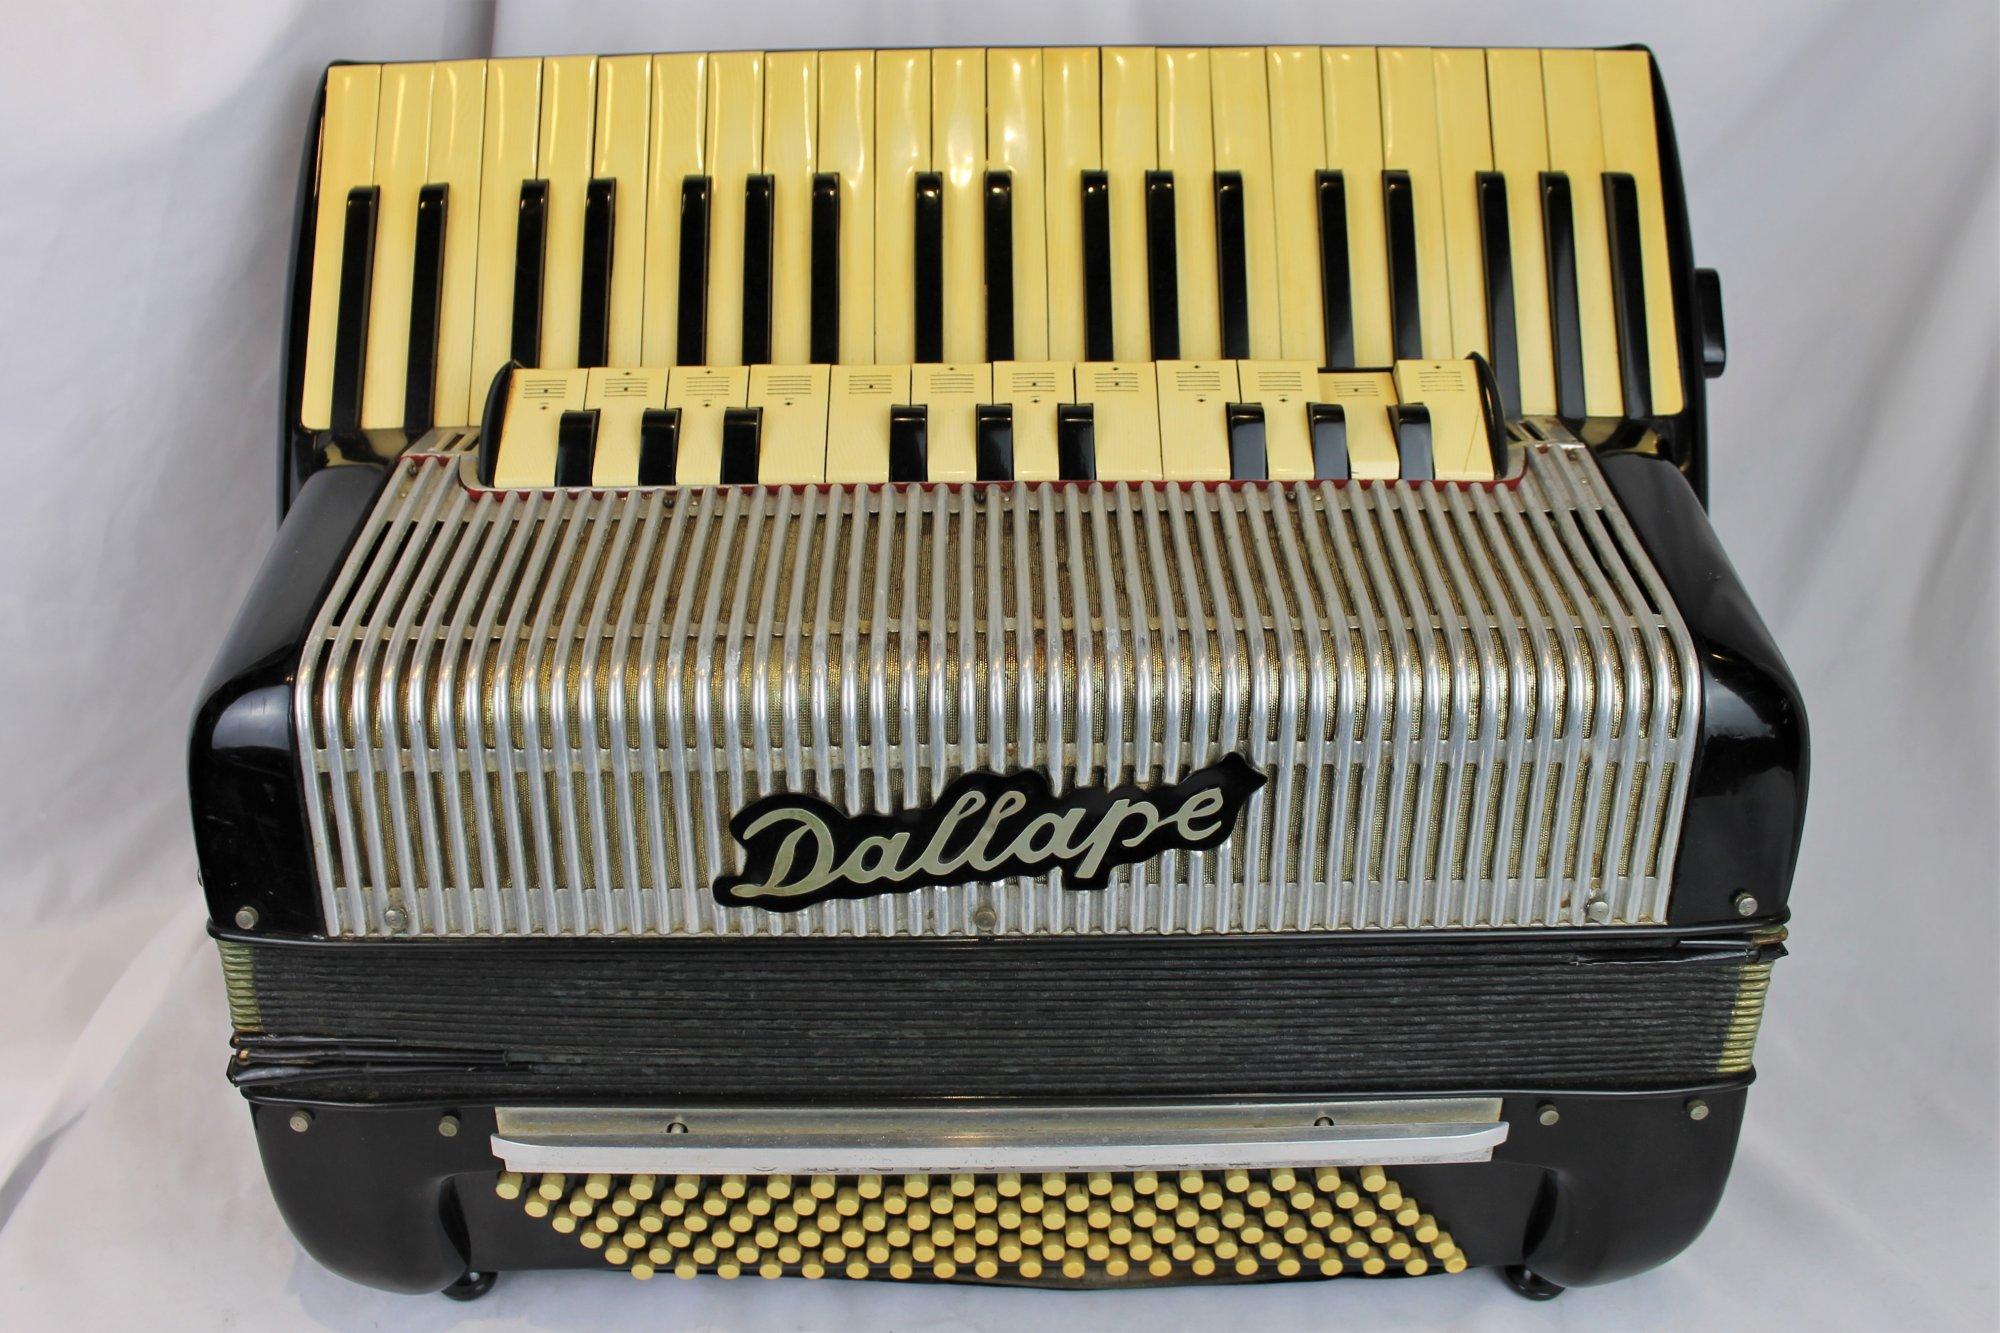 4632 - Black Dallape Organtone Piano Accordion LMH 41 120 - For Parts or Repair